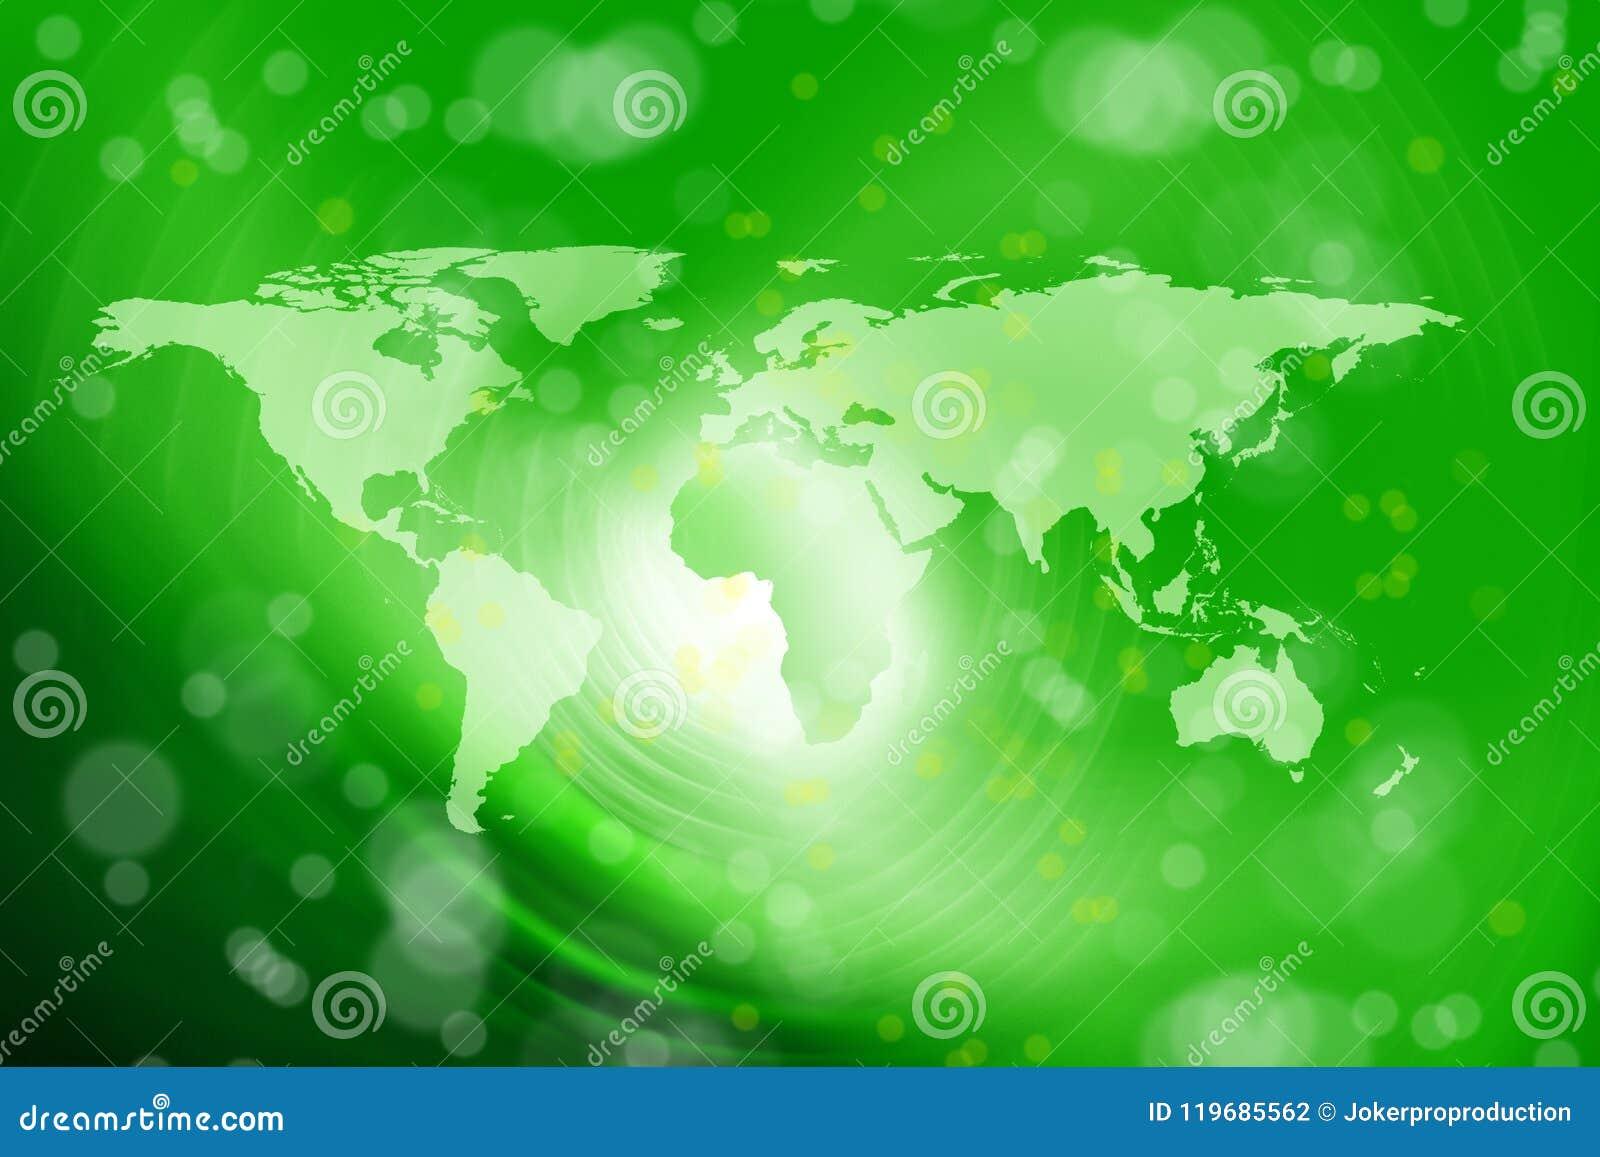 Abstract world map stock illustration  Illustration of global